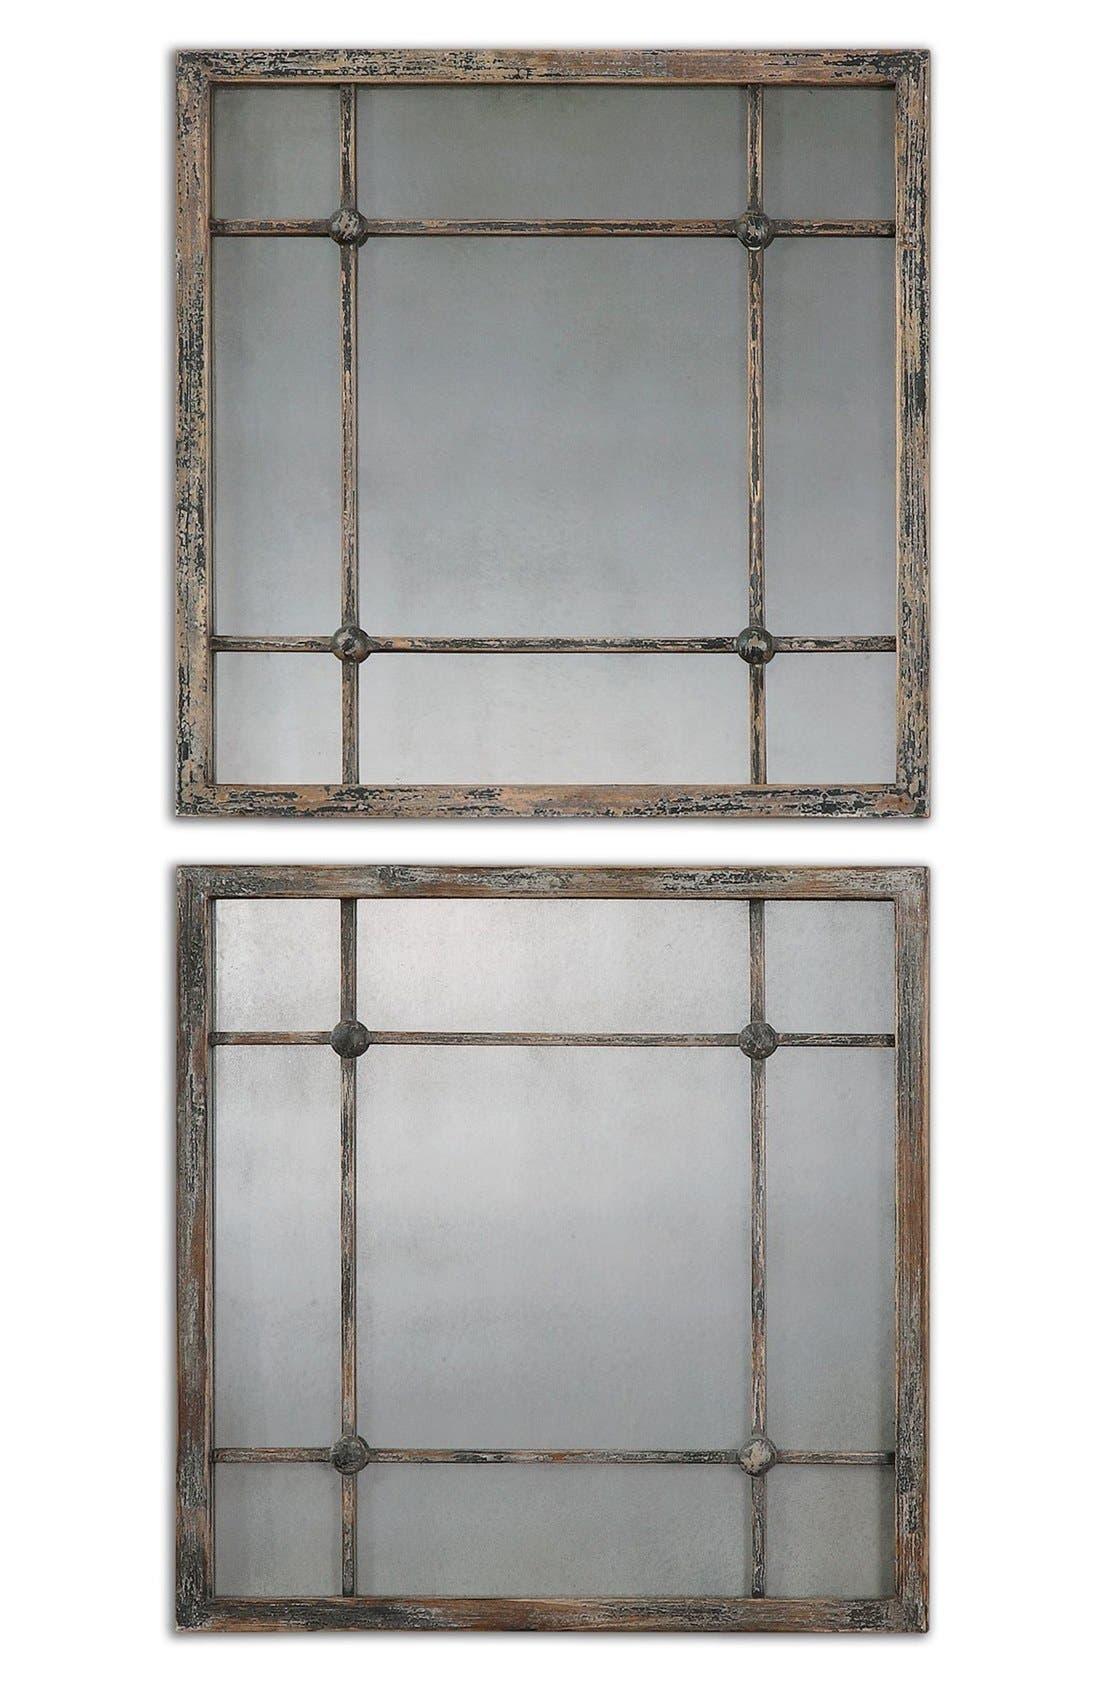 Main Image - Uttermost 'Saragano' Square Mirror (Set of 2)